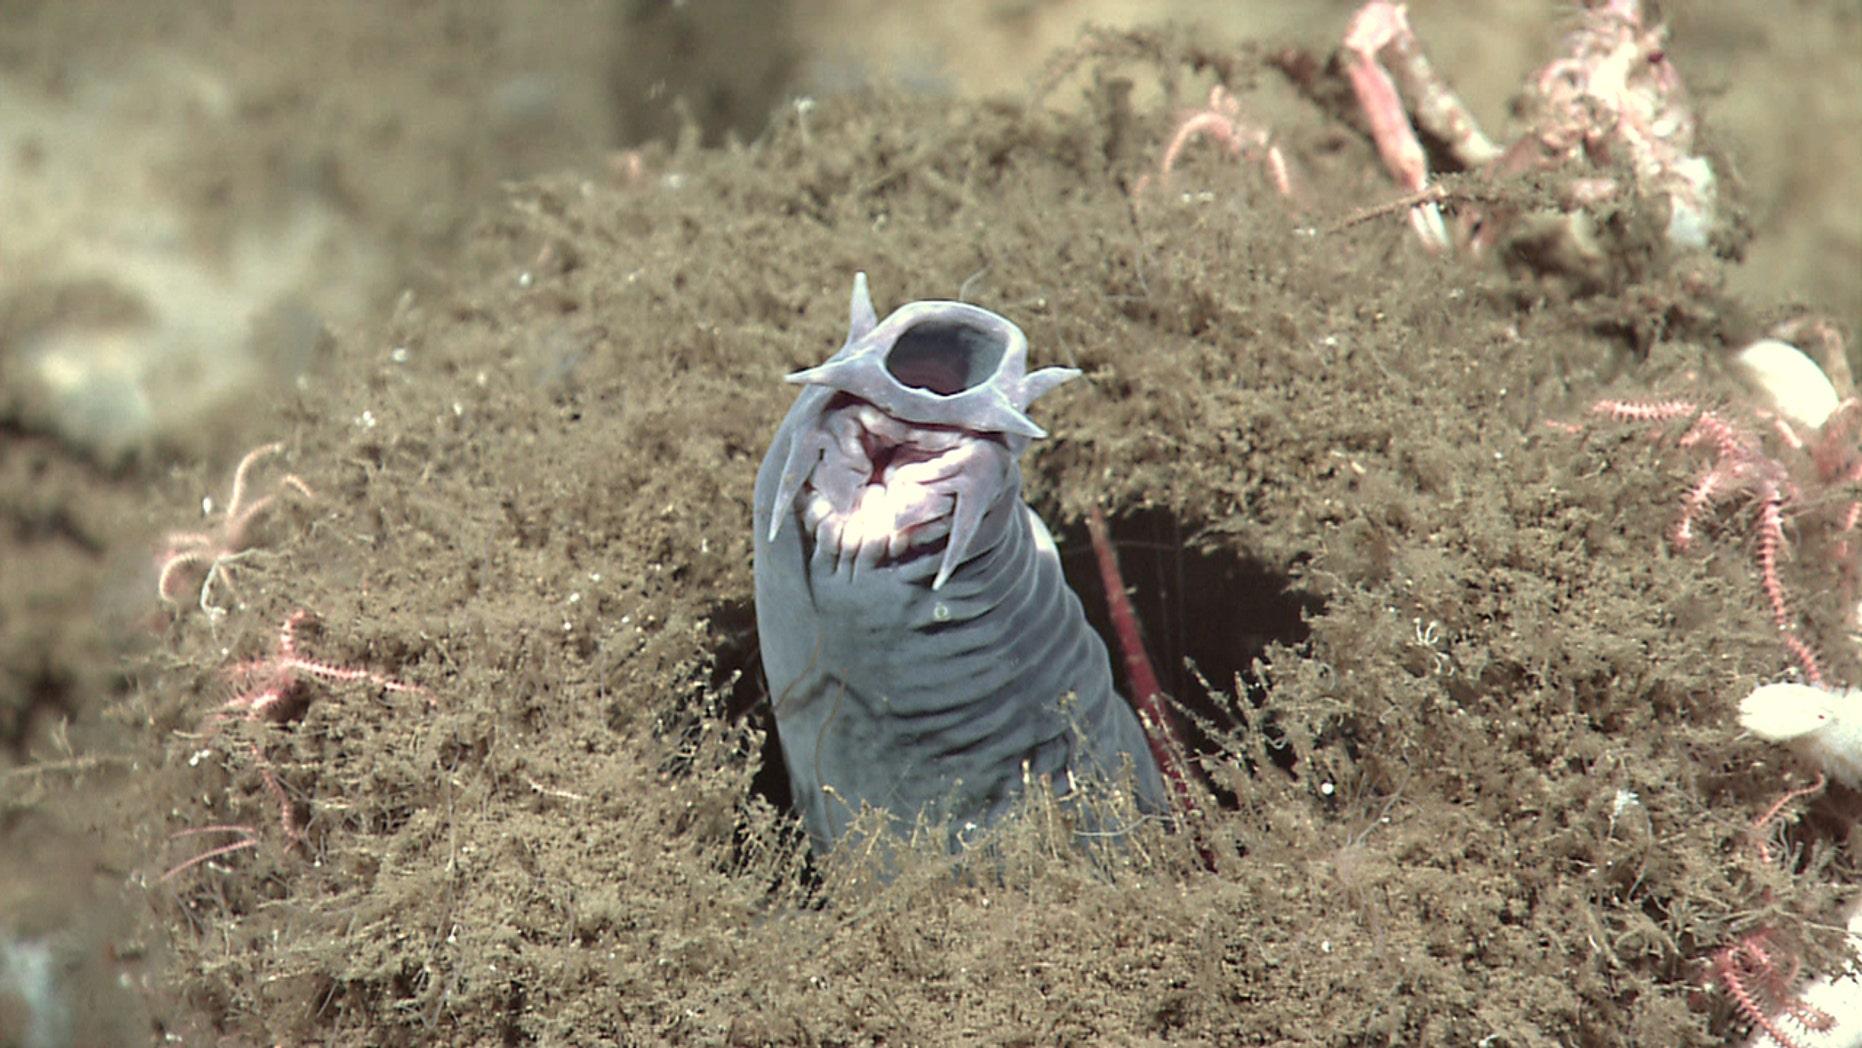 A hagfish protruding from a sponge. (Credit: NOAA Okeanos Explorer Program)